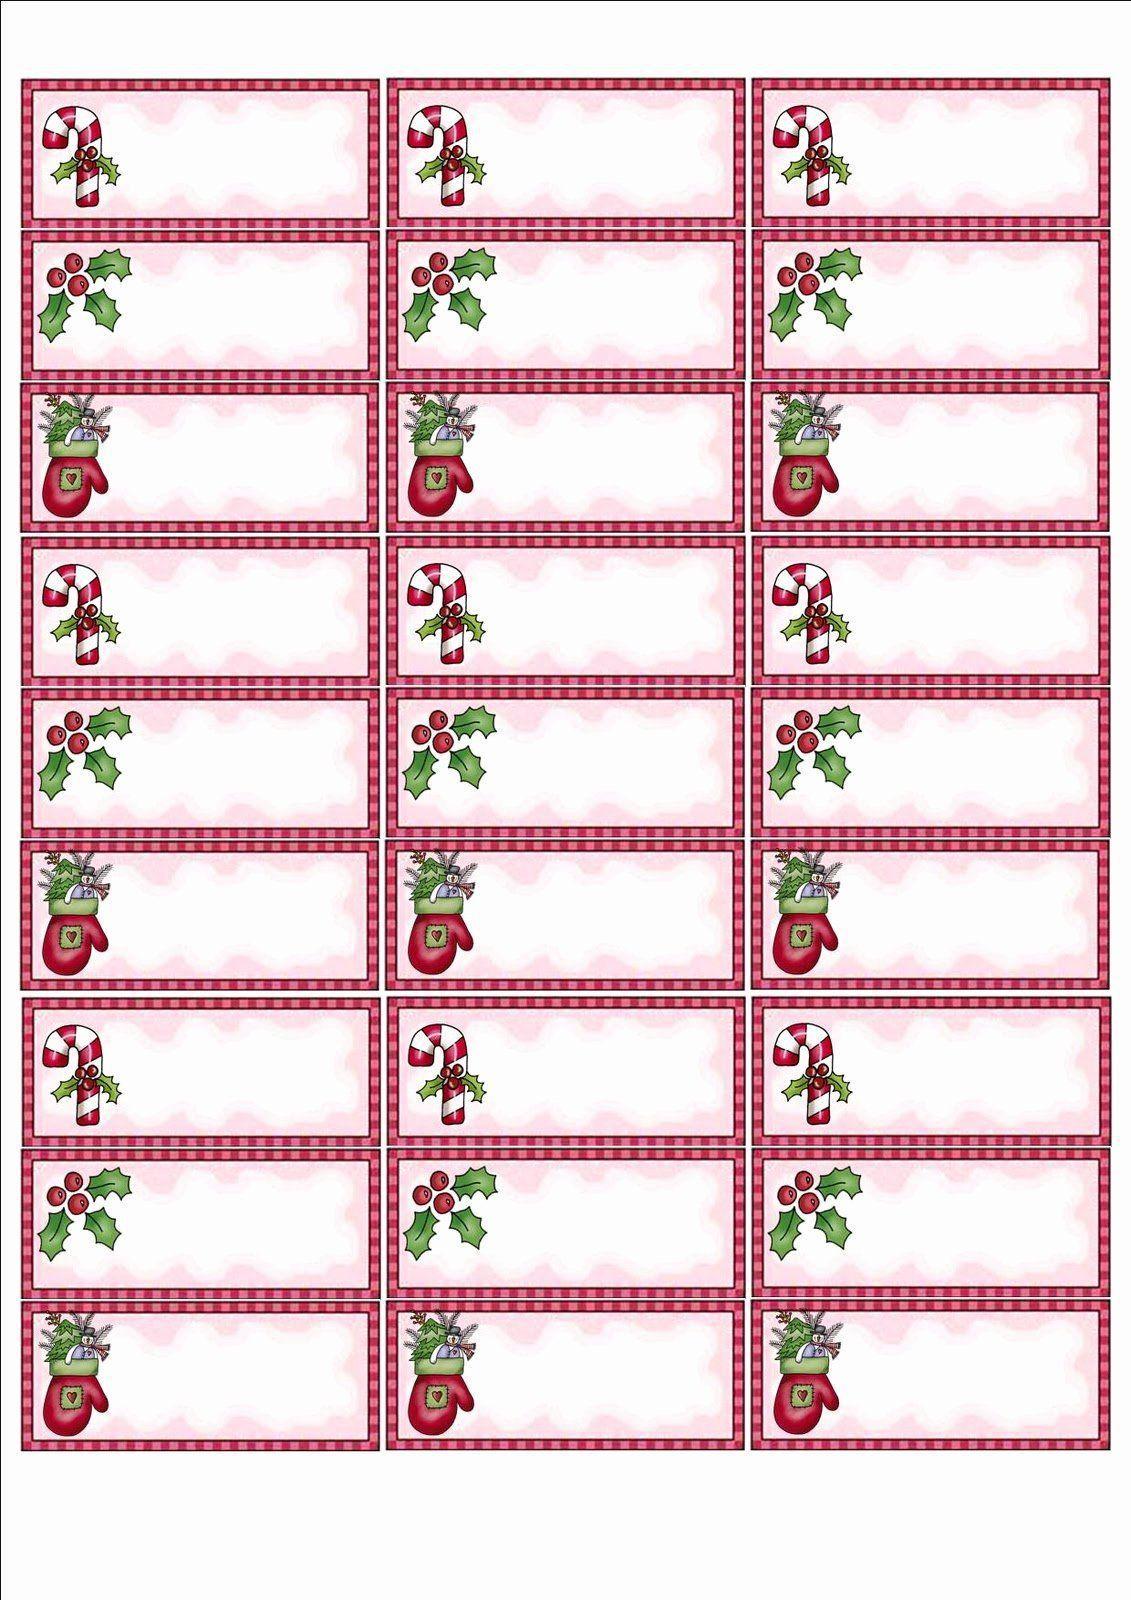 003 Incredible Free Addres Label Template Christma High Definition  Christmas Return 30 Per Sheet Microsoft WordFull